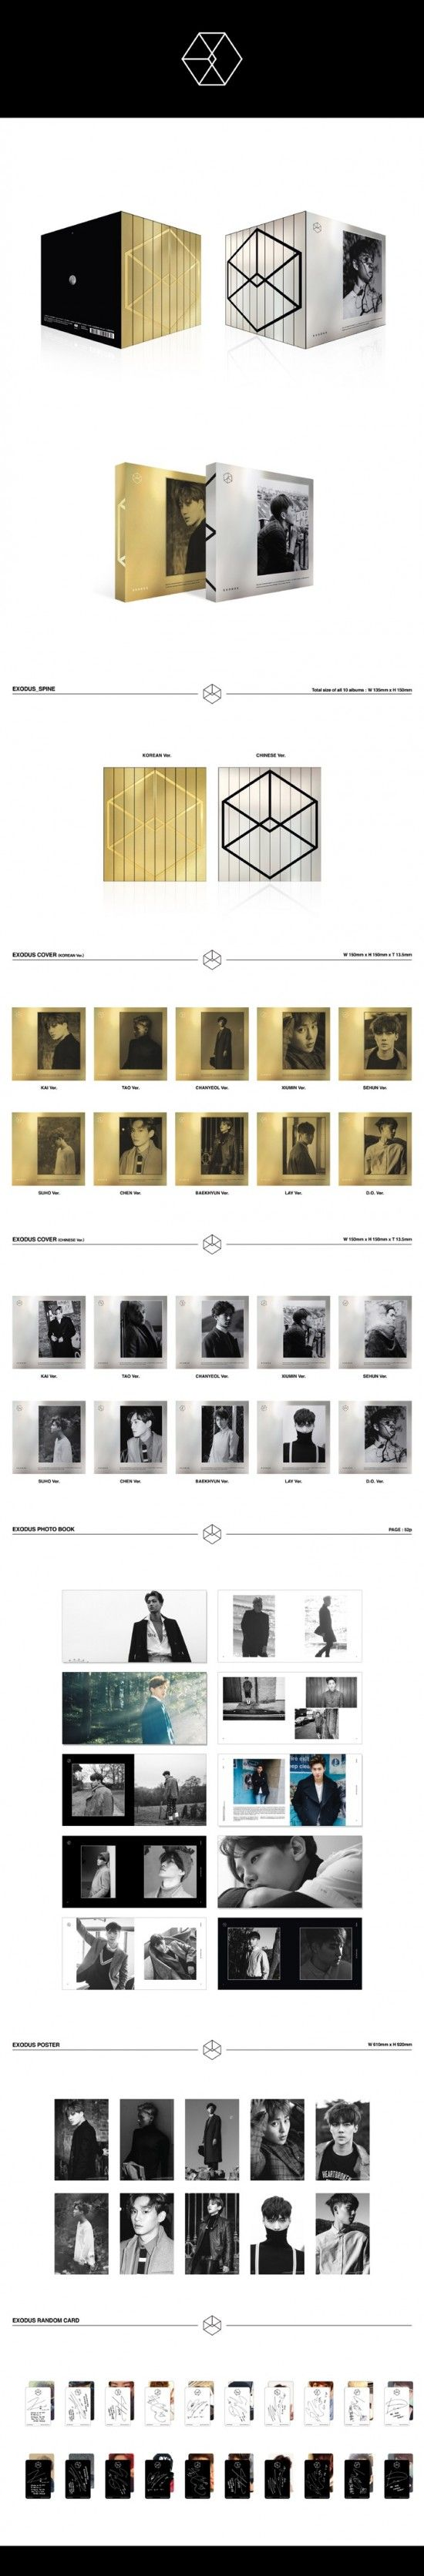 Details and tracklist for EXO's 2nd album 'EXODUS' revealed | allkpop.com